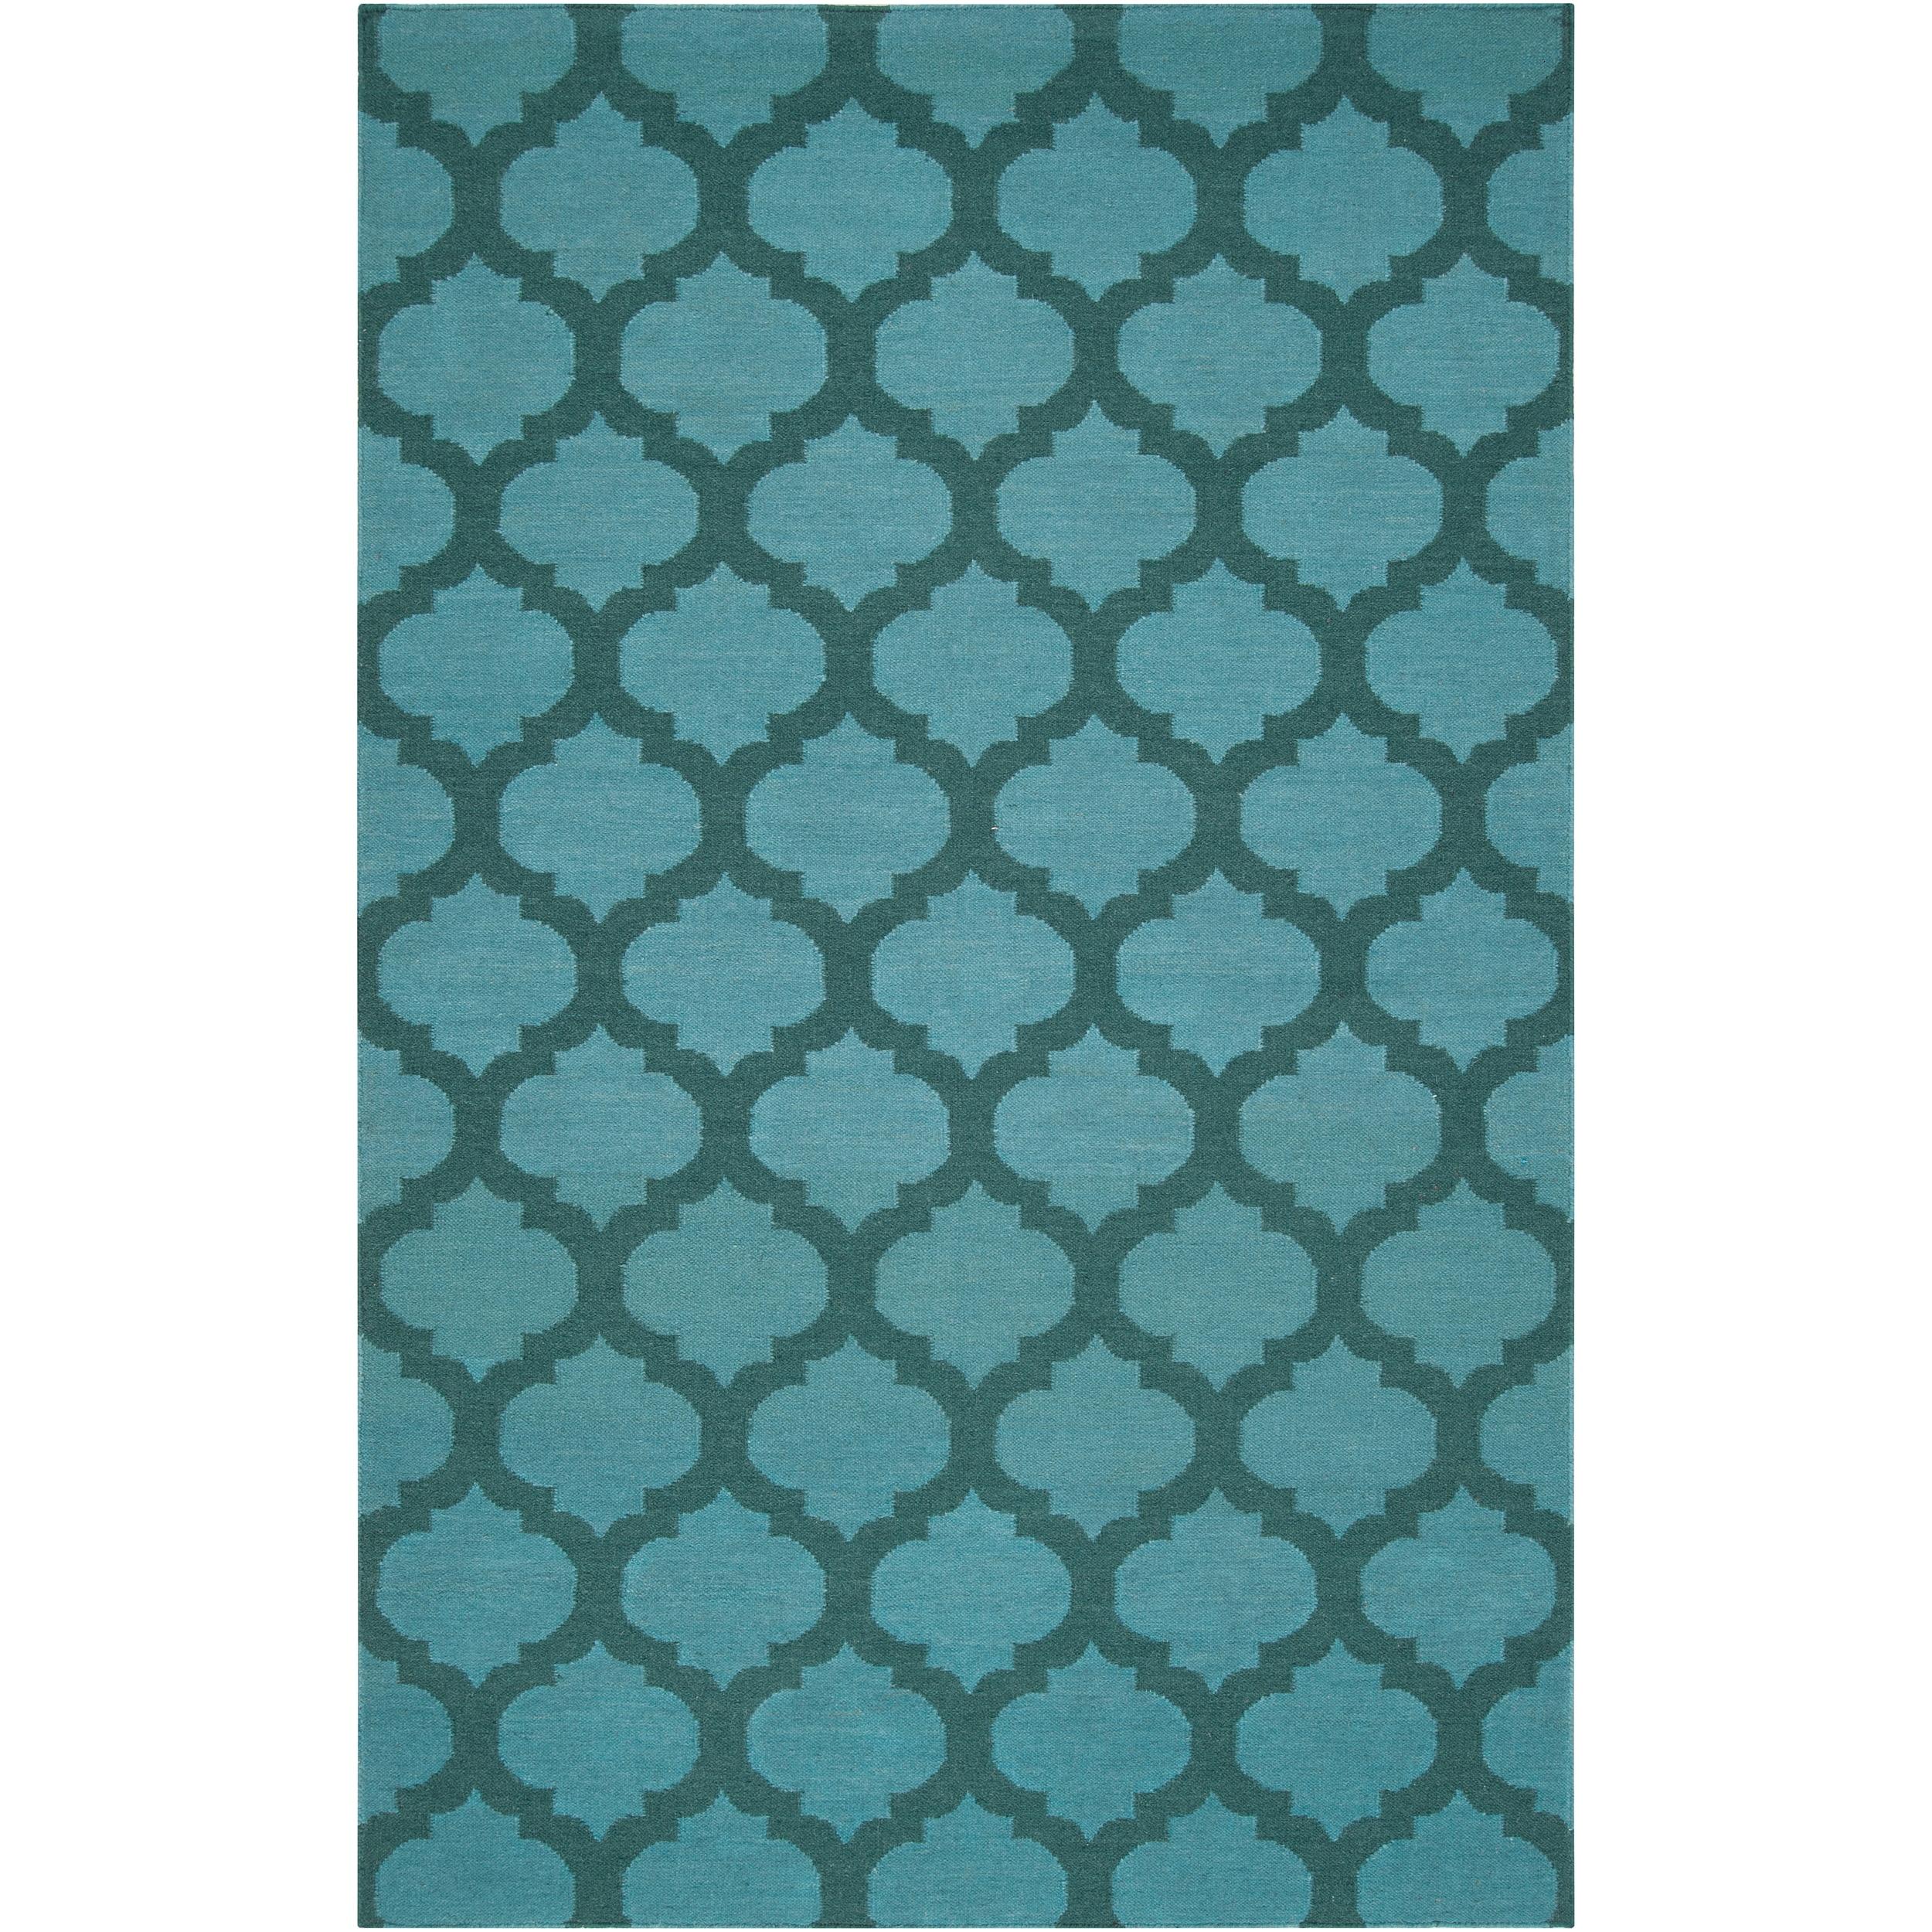 Hand-woven 'Caroni' Blue Wool Rug (8' x 11'), Size 8' x 11'